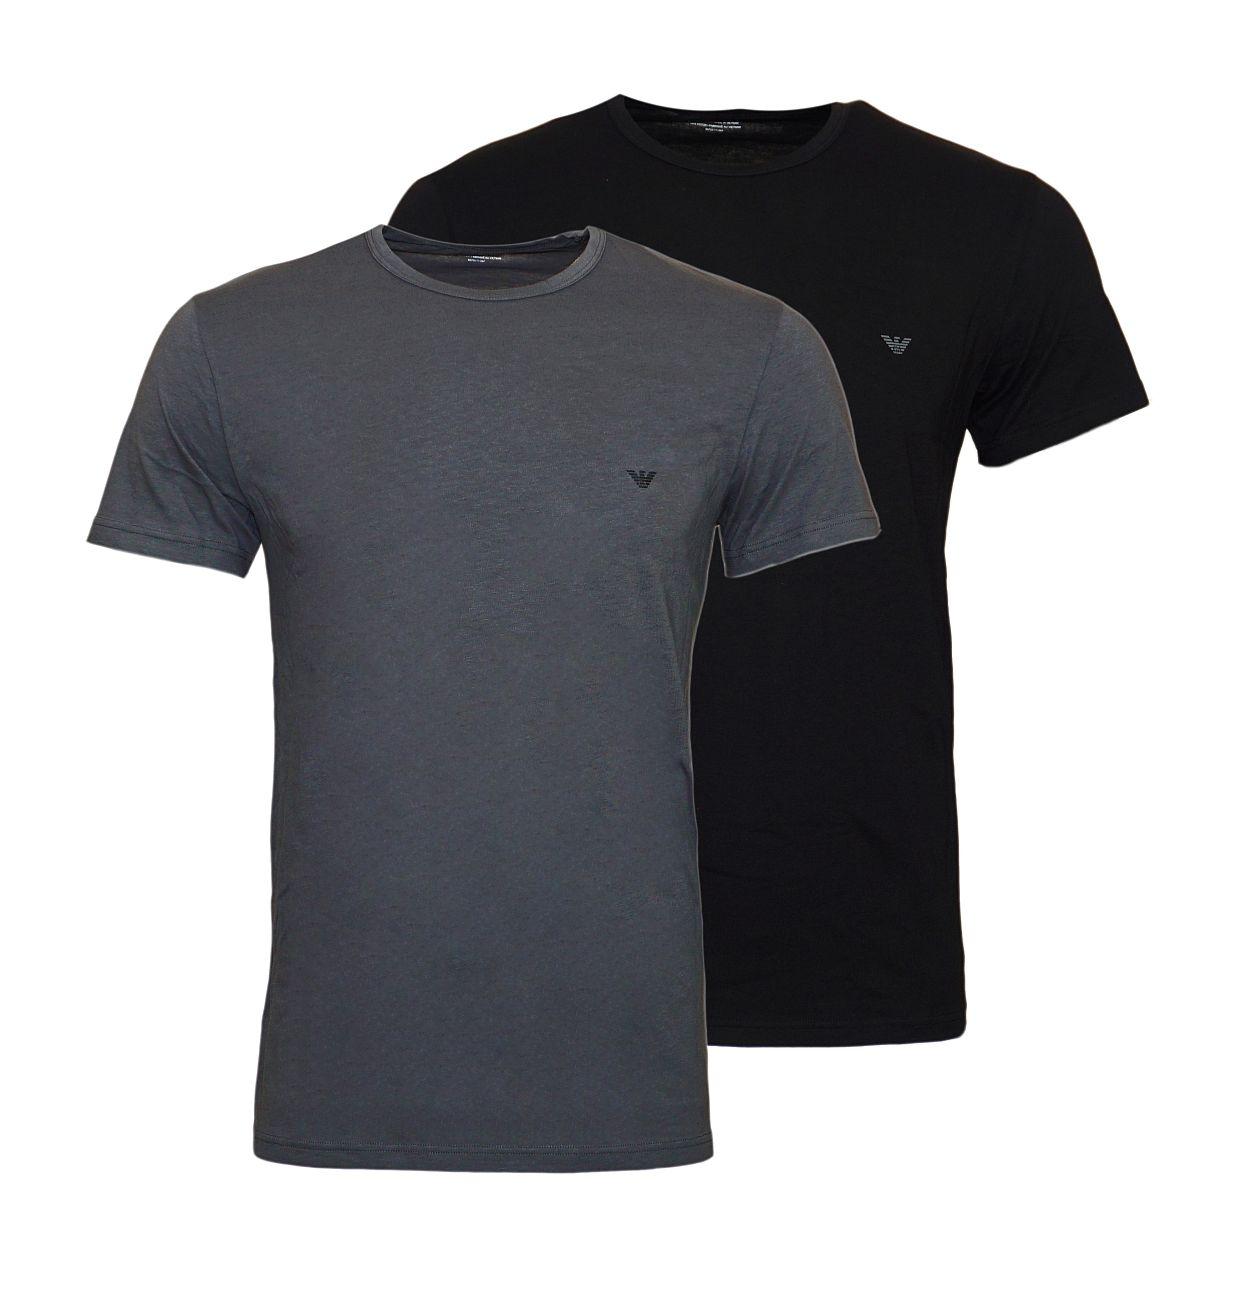 Emporio Armani 2er Pack T-Shirt Rundhals 111267 8A722 41720 NERO/ANTRACITE WX18-EAT